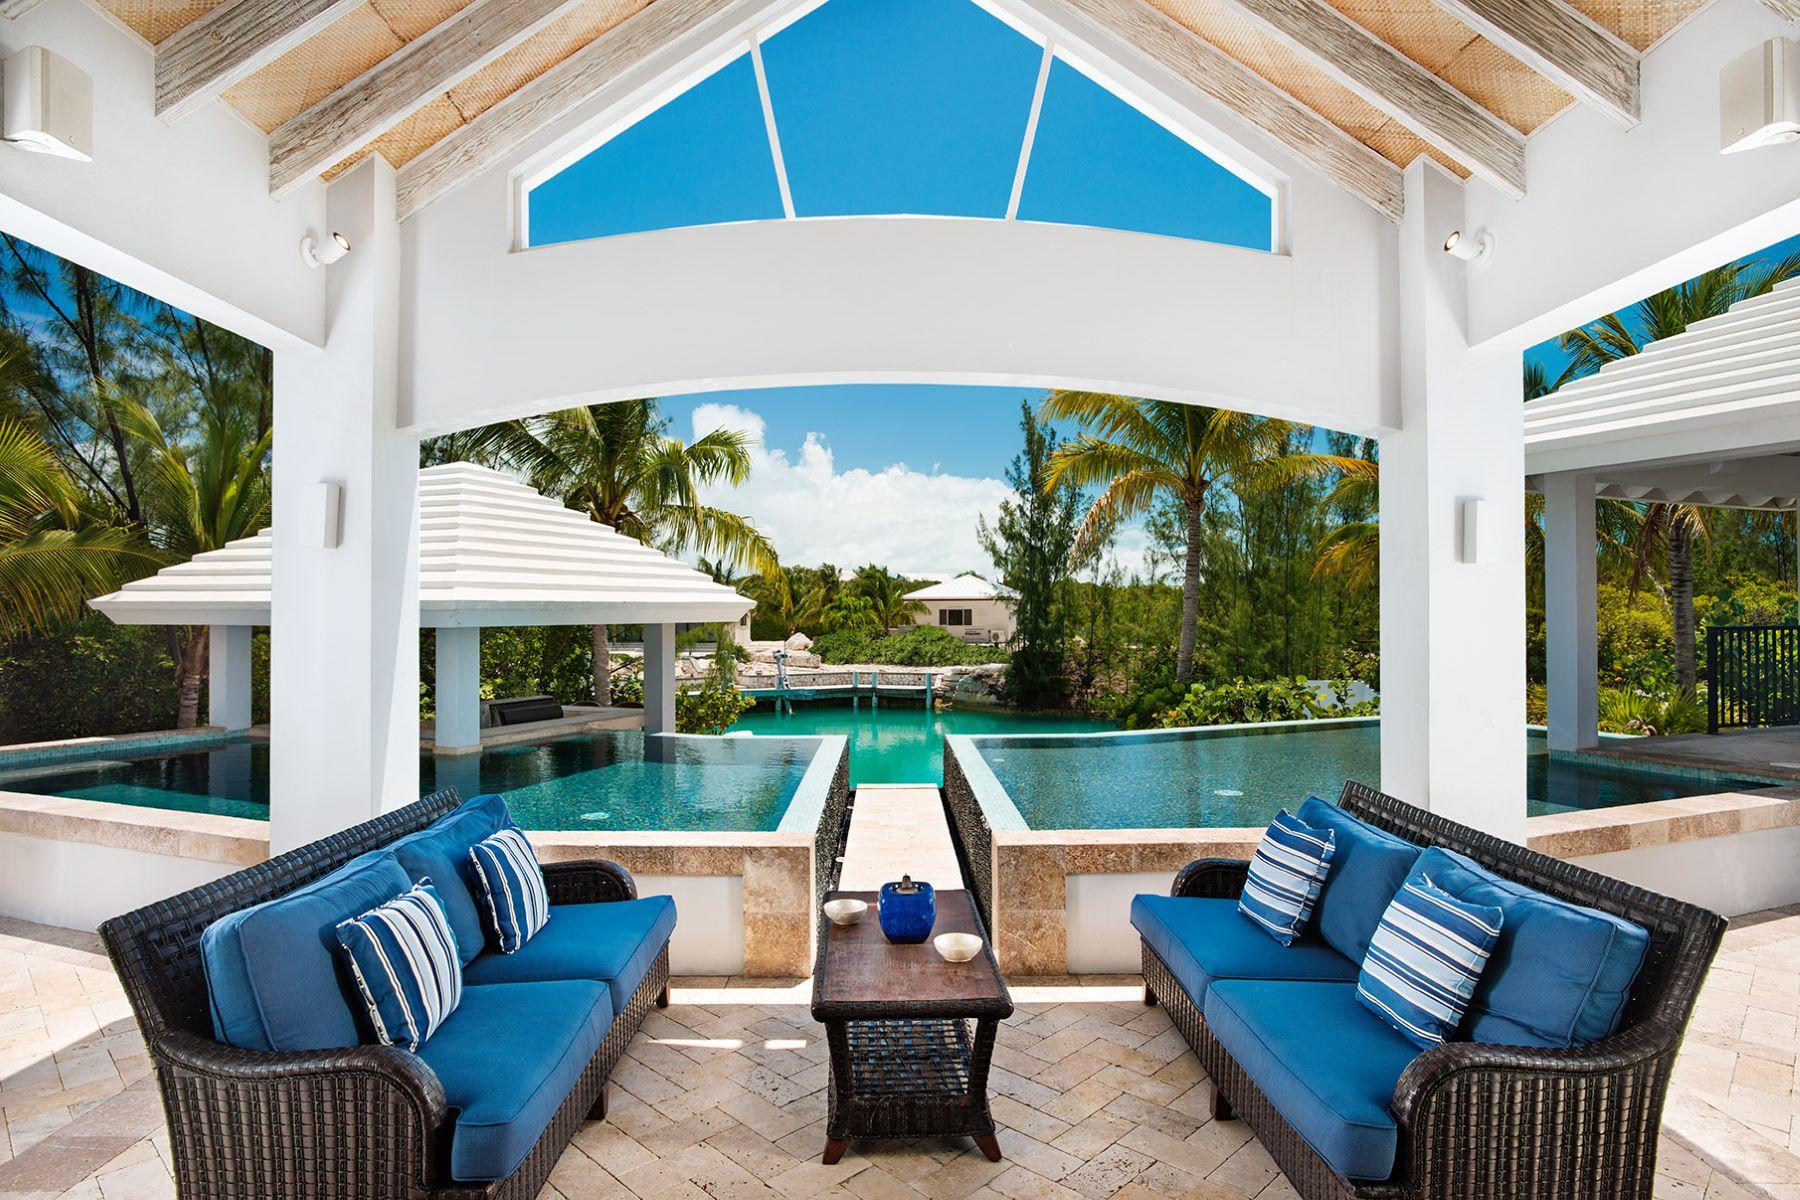 独户住宅 为 销售 在 Canalfront Home Governor's Road Leeward, 普罗维登夏, 特克斯和凯科斯群岛